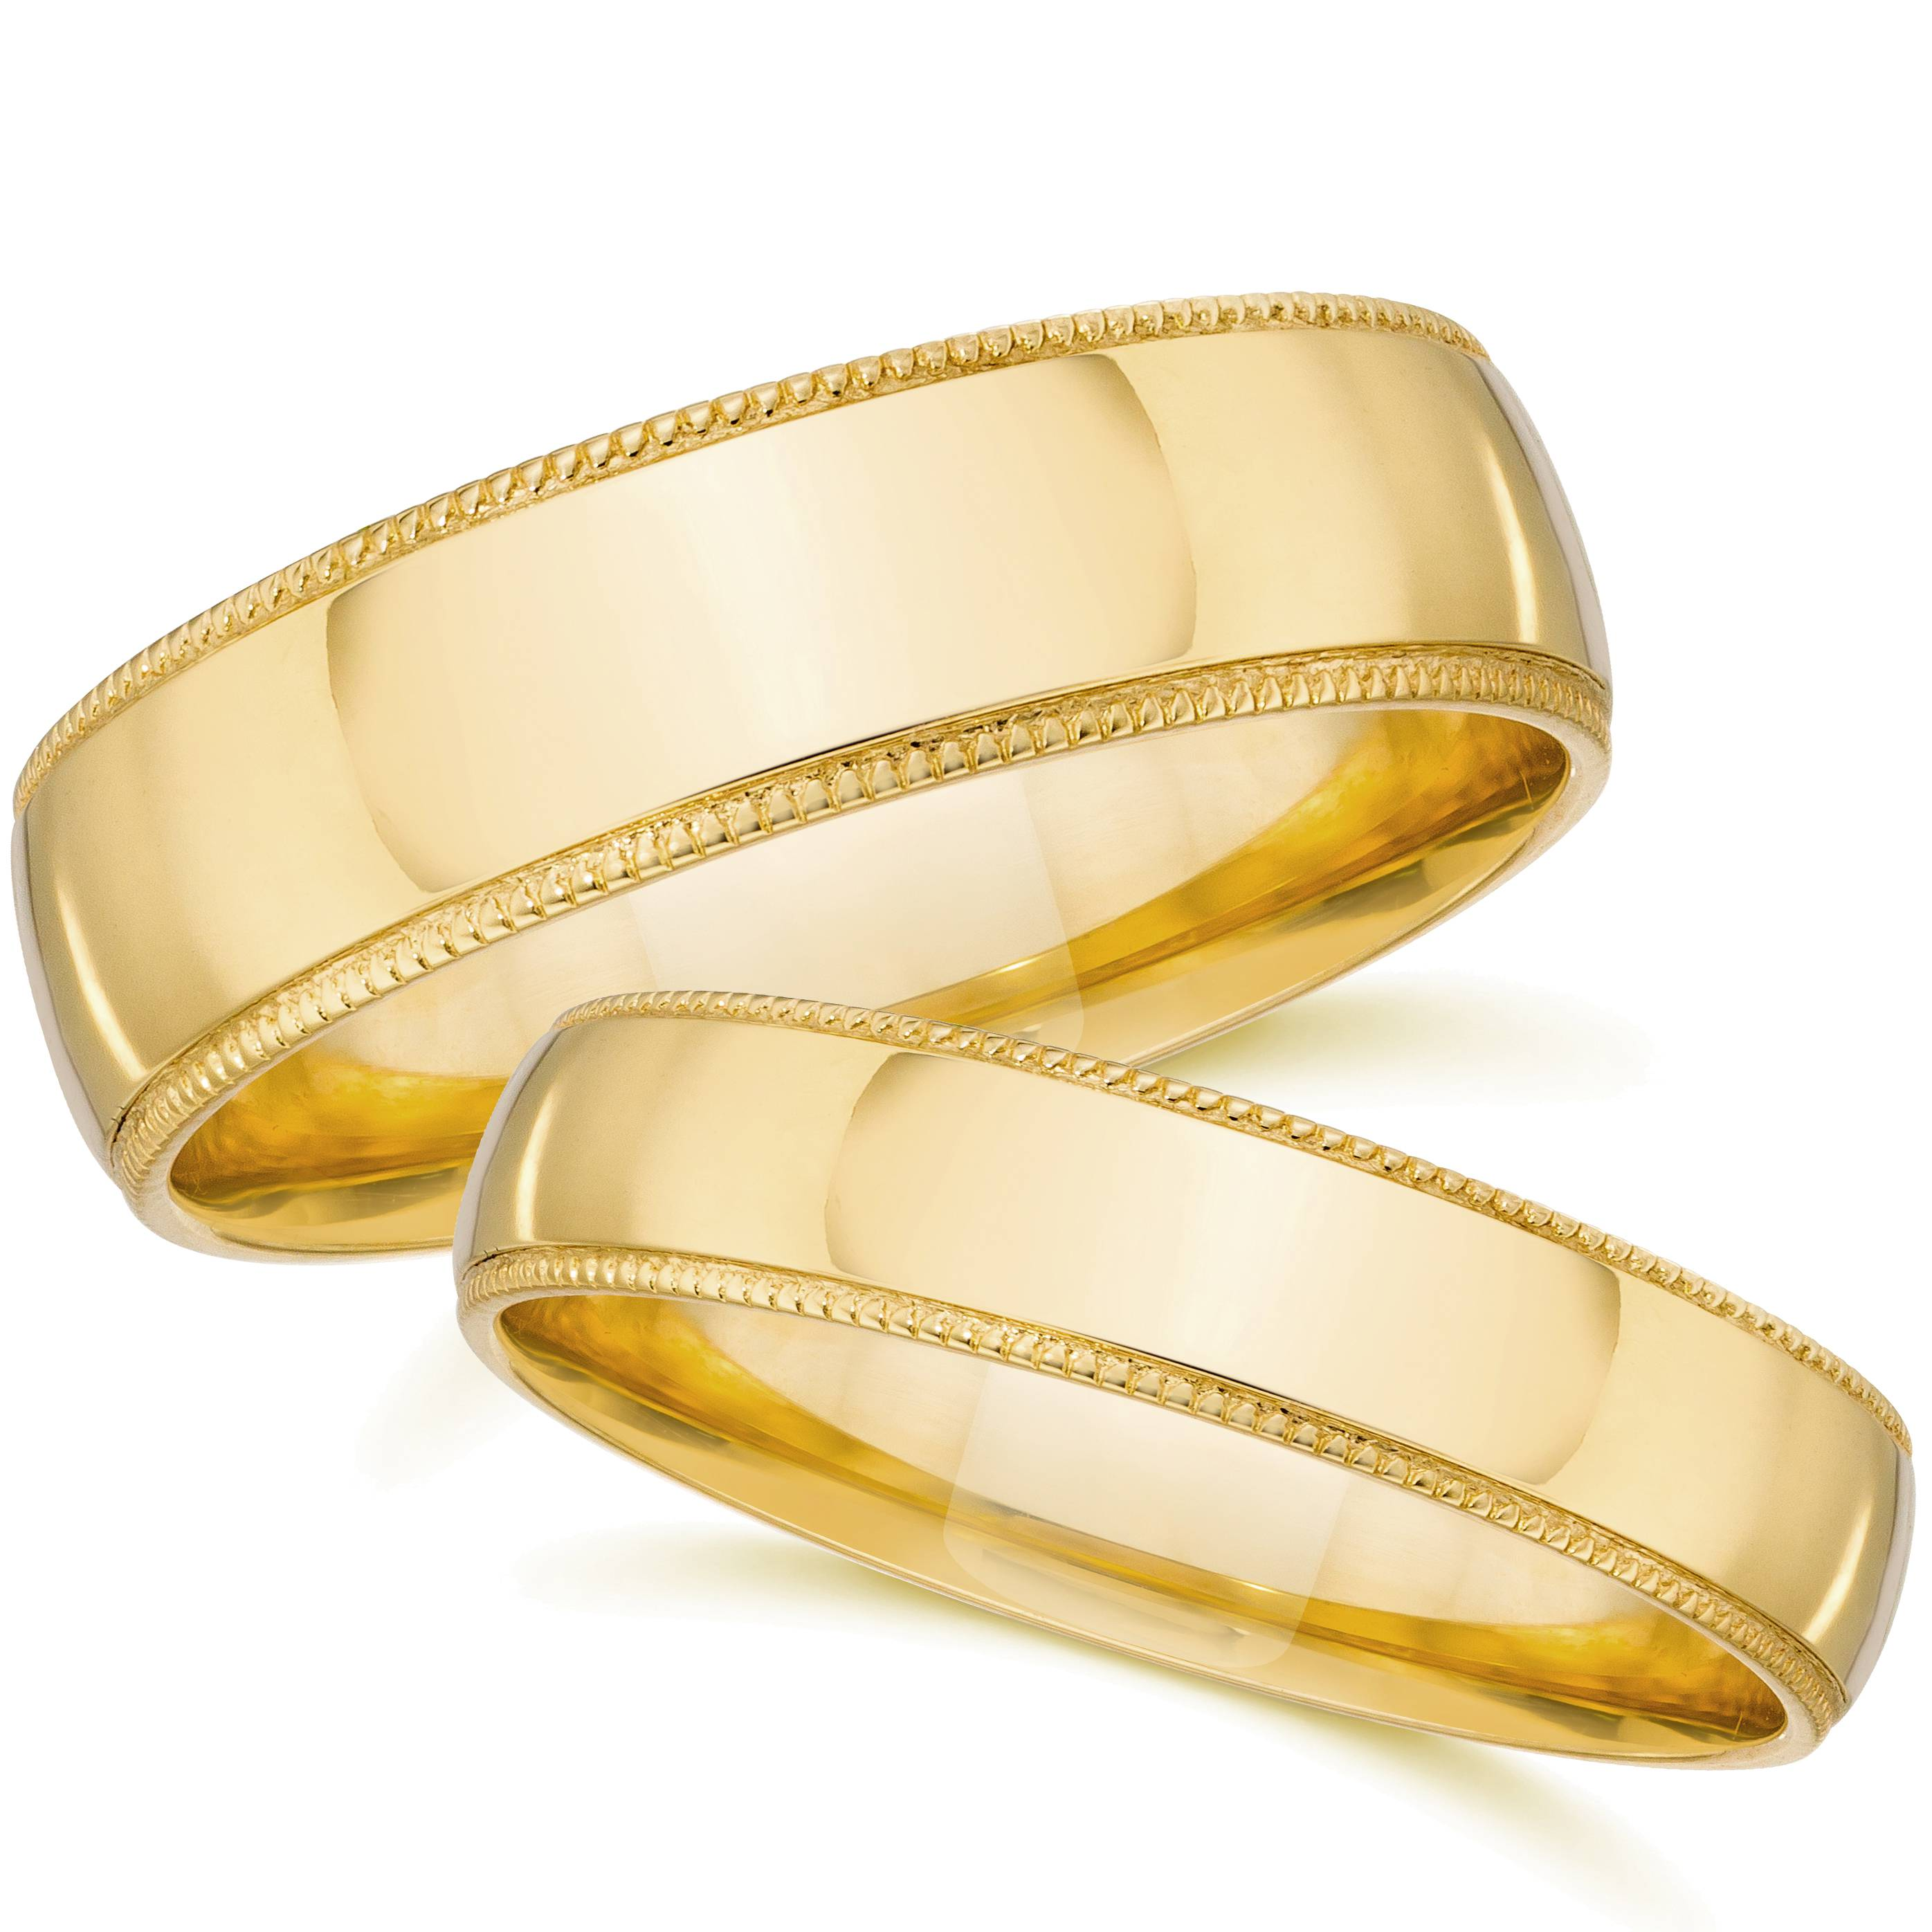 Matching Bands: Yellow Gold Matching Wedding Bands Mens Womens Plain